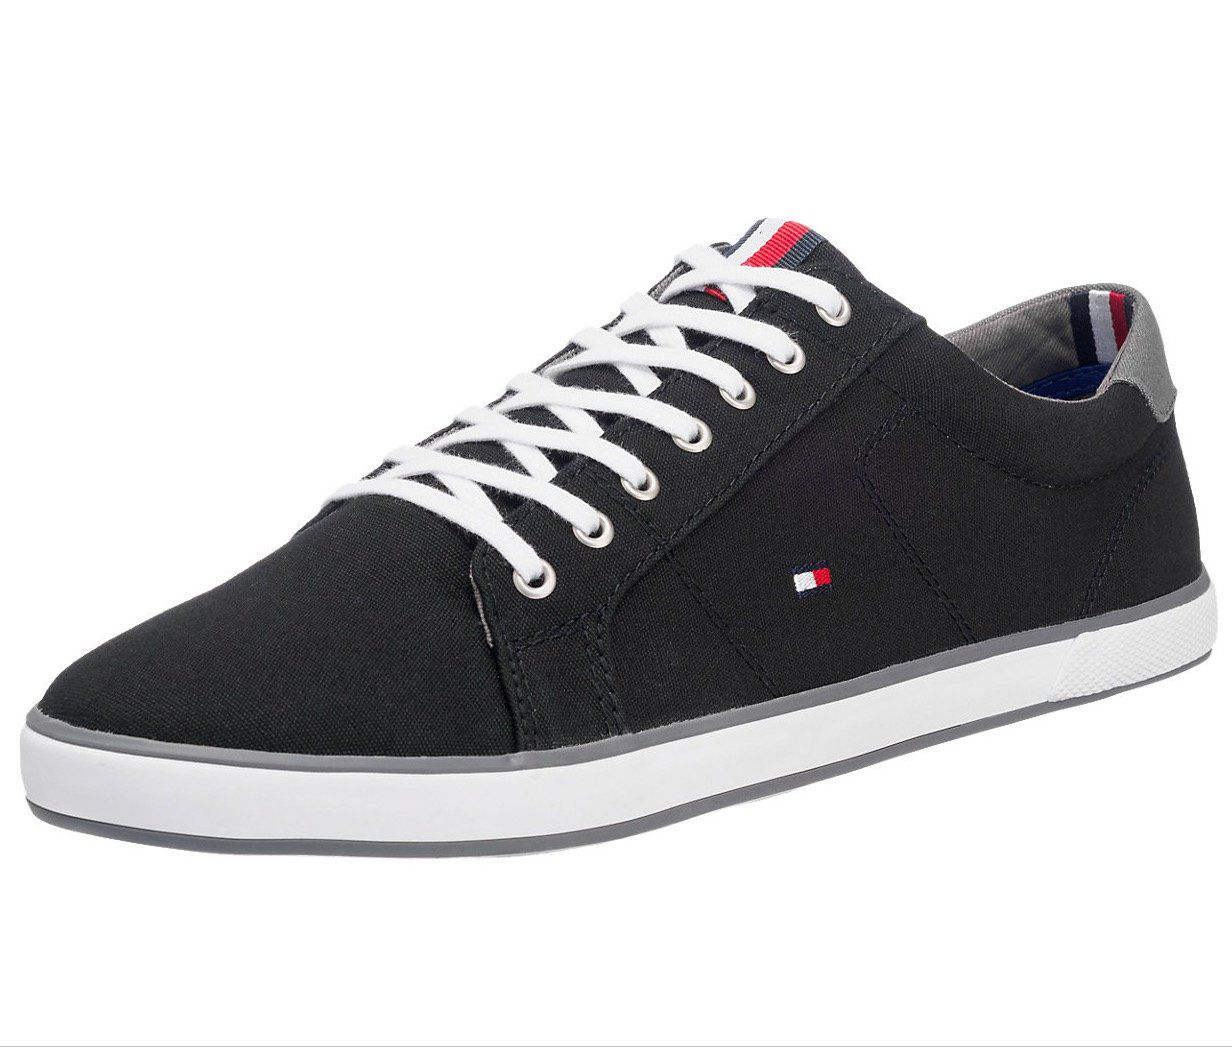 Tommy Hilfiger Harlow 1D Lowcut-Sneaker für 29,99€(statt 40€)